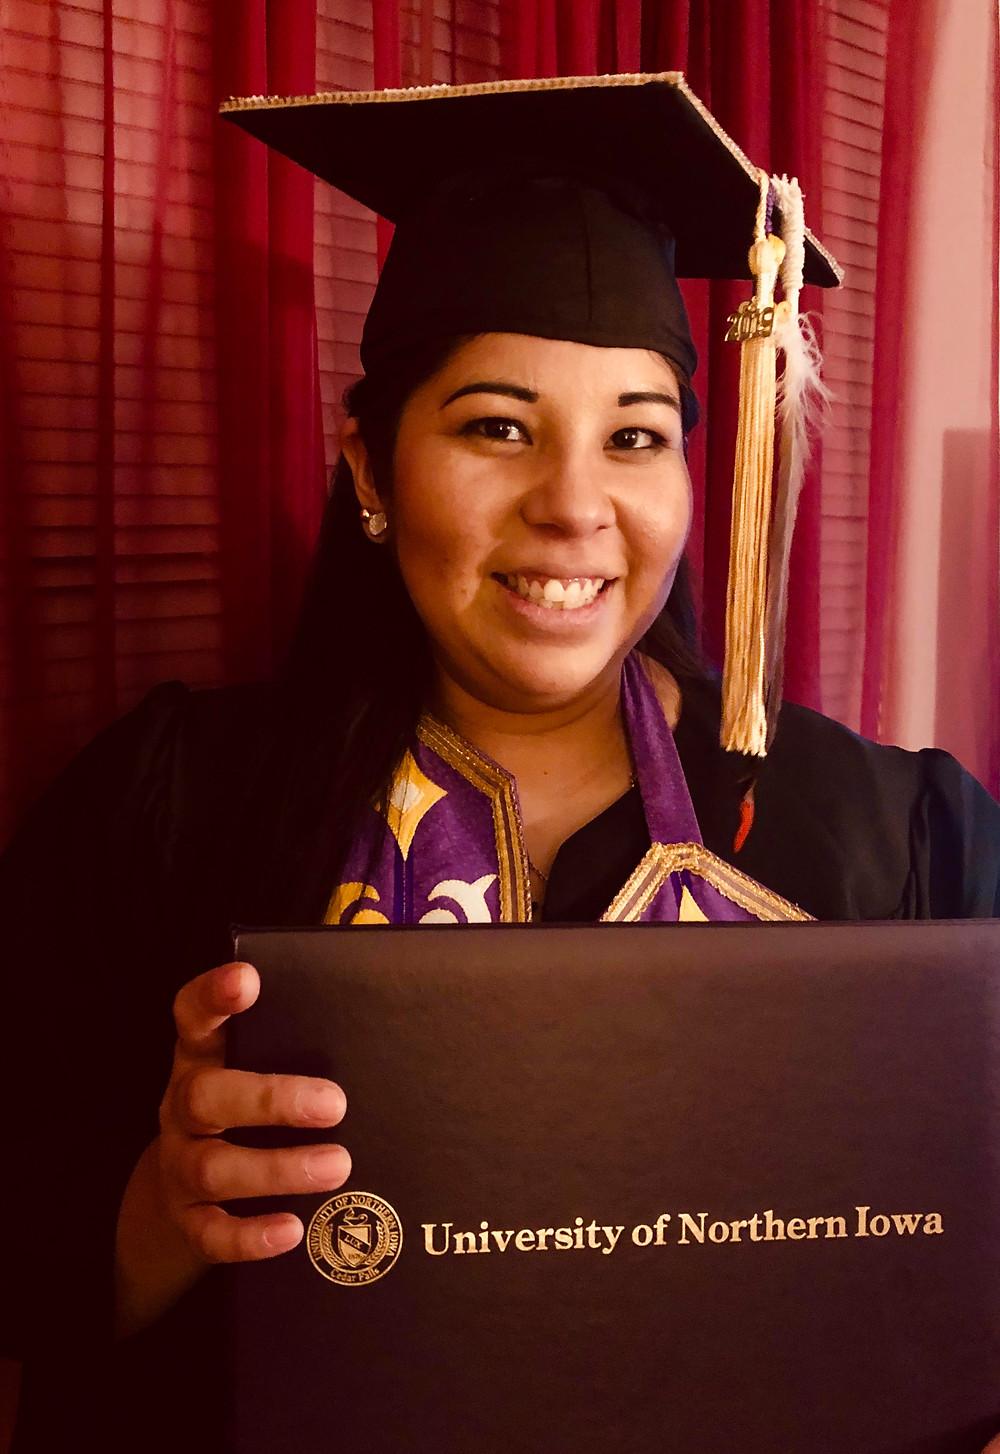 Trisha Caxsep Guwiga Etringer at her graduation ceremony at the University of Northern Iowa in Spring 2019